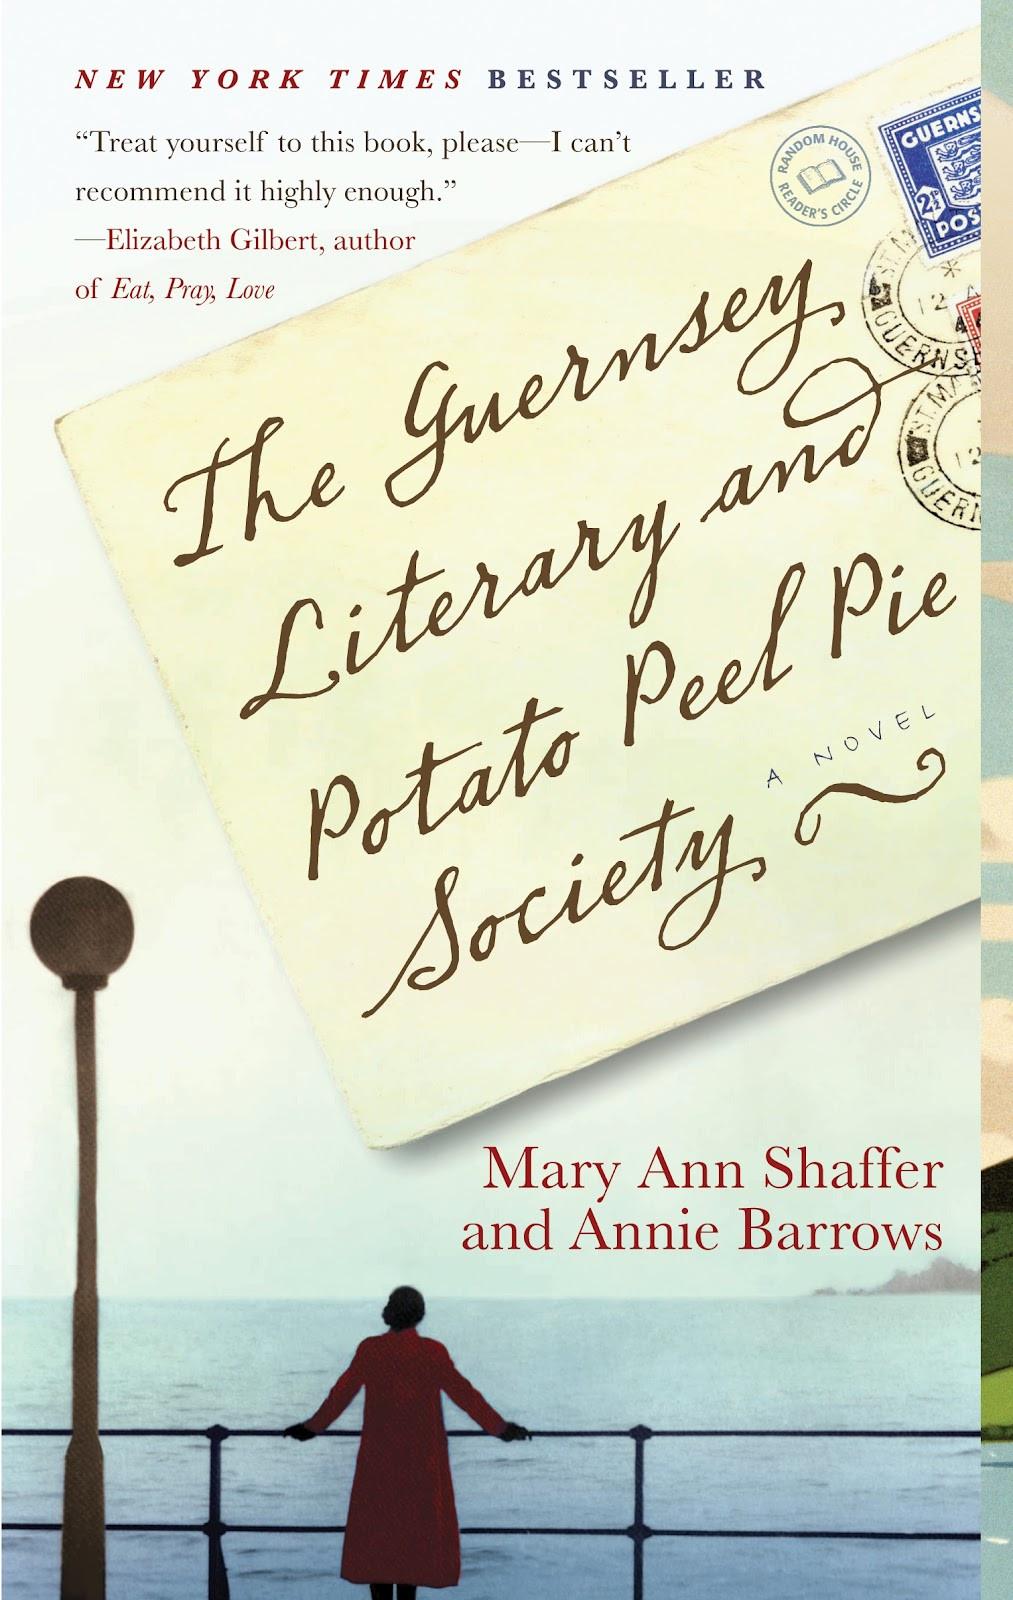 Guernsey Literary And Potato Peel Pie Society  ALPHA reader 'The Guernsey Literary and Potato Peel Pie